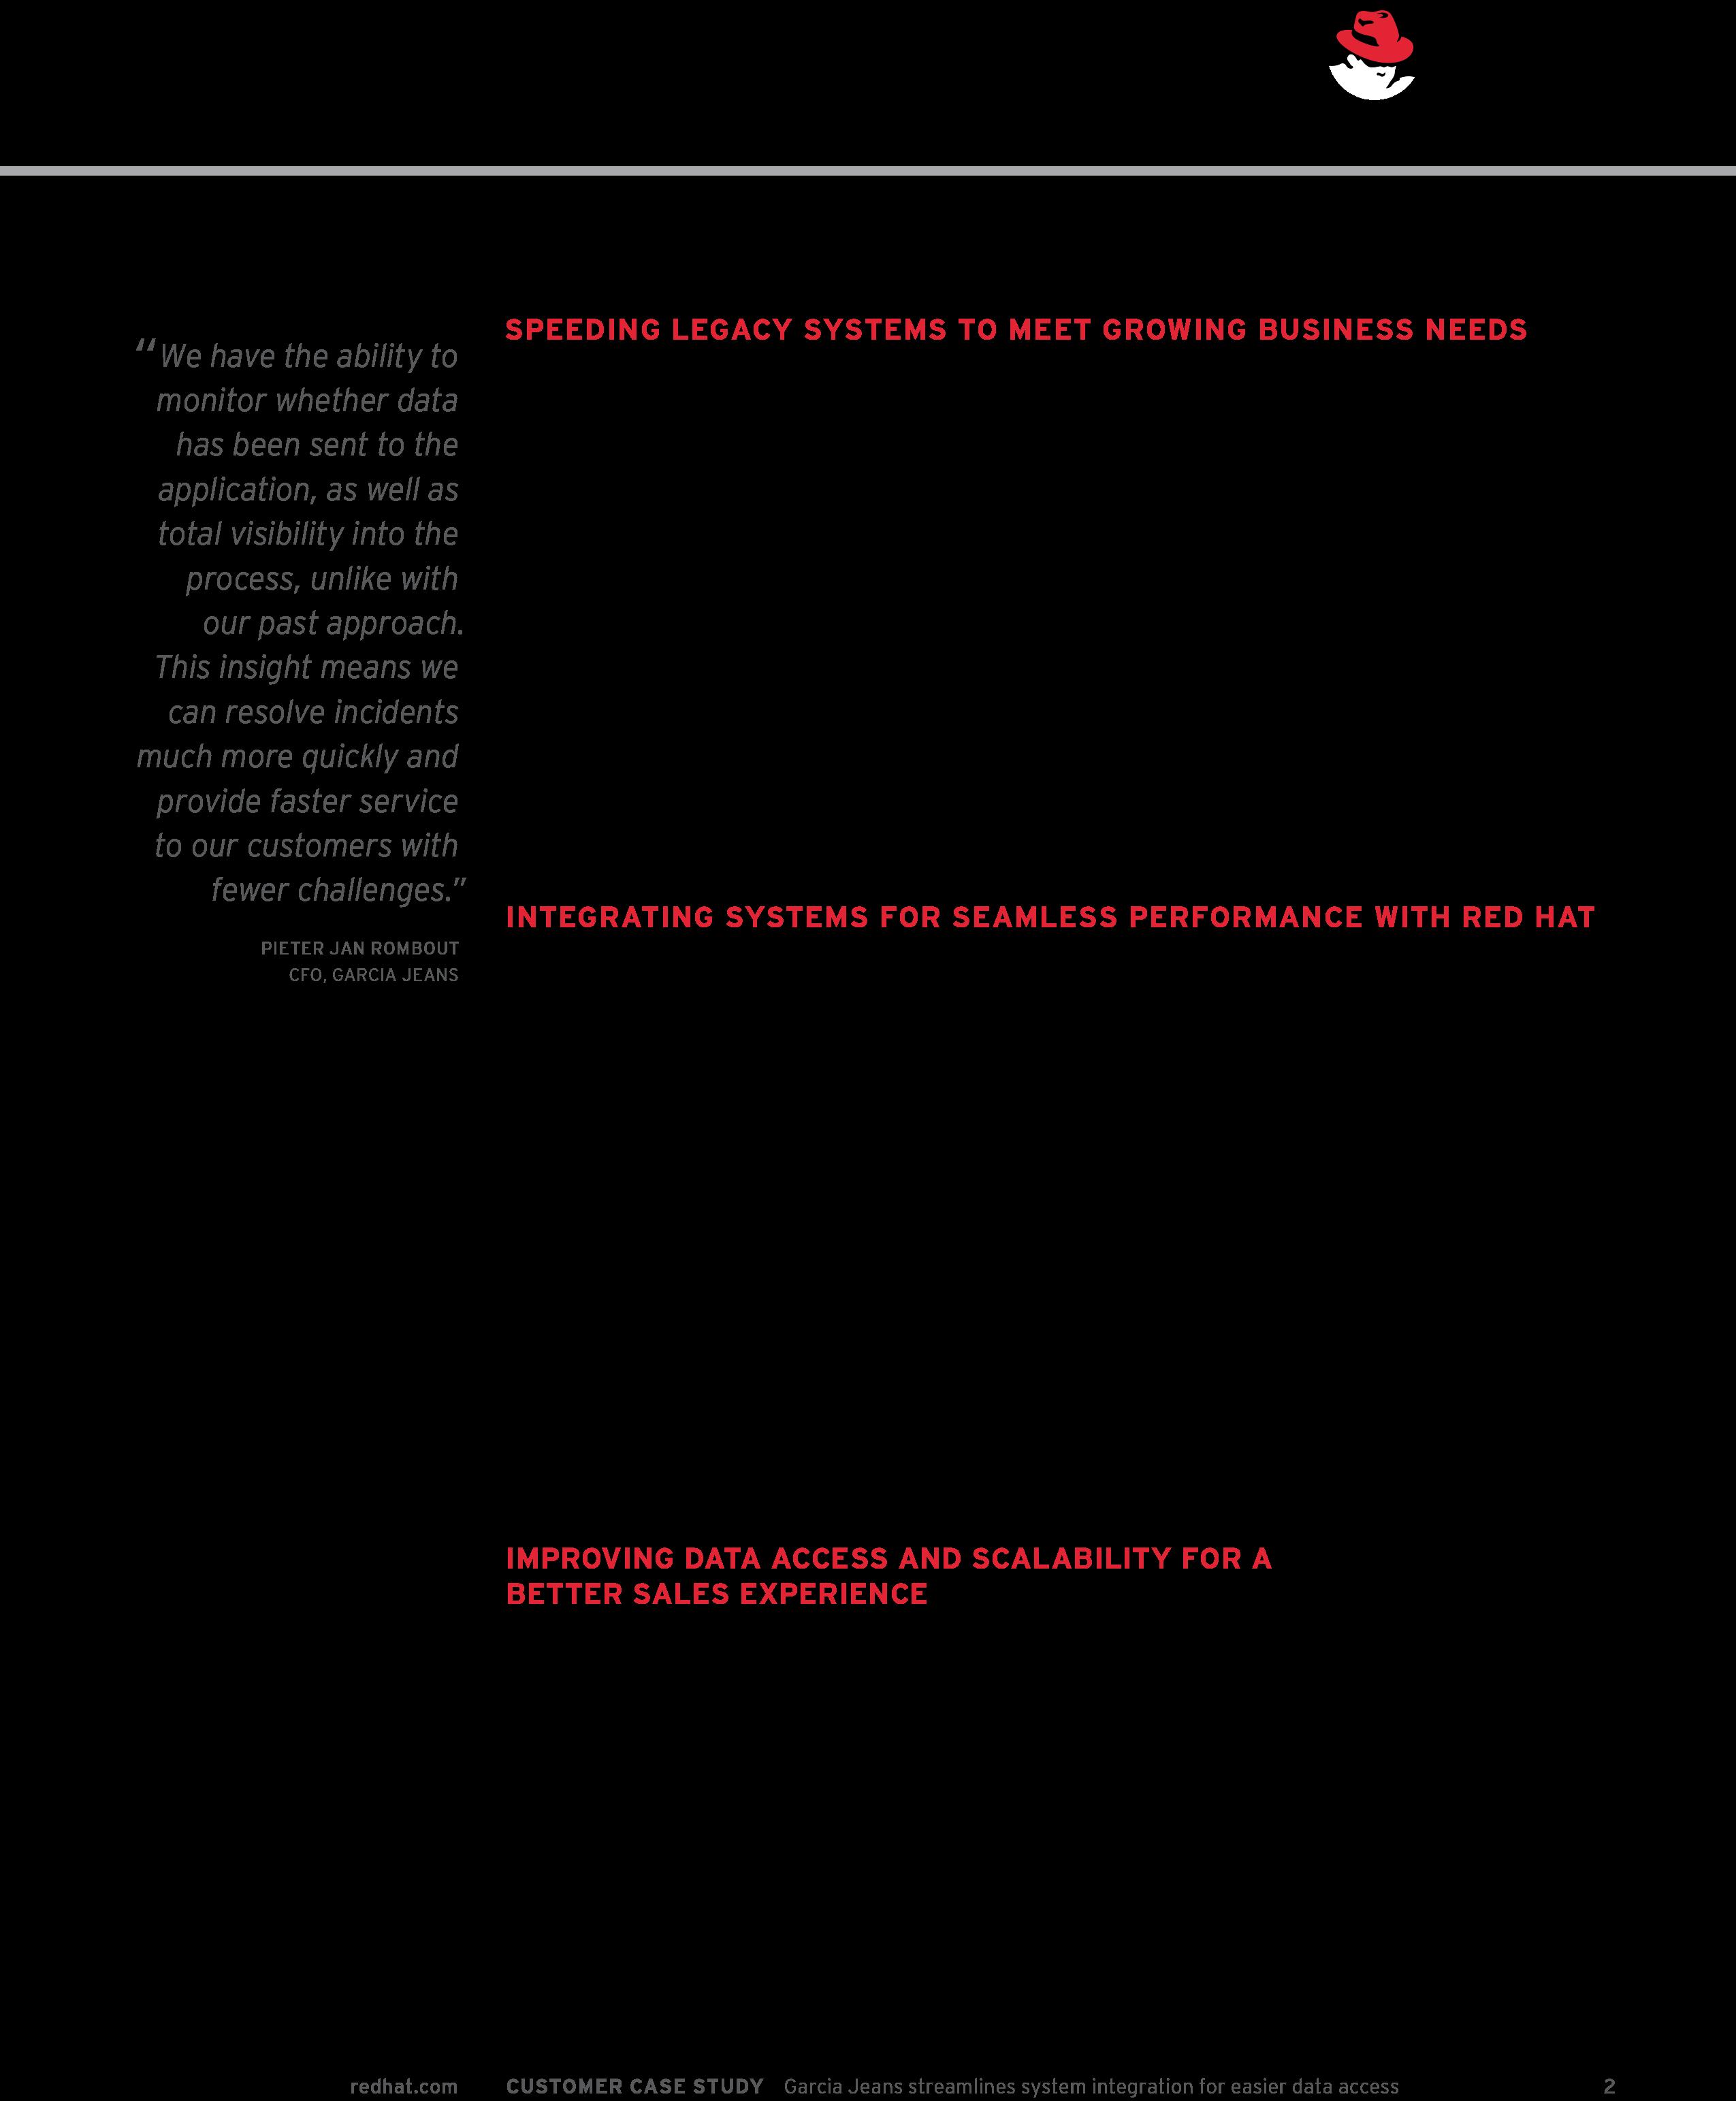 rh-garcia-jeans-automates-integrates-application-systems-sales-data-retail-jboss-fuse-case-study-f8157kc-201712-en-2